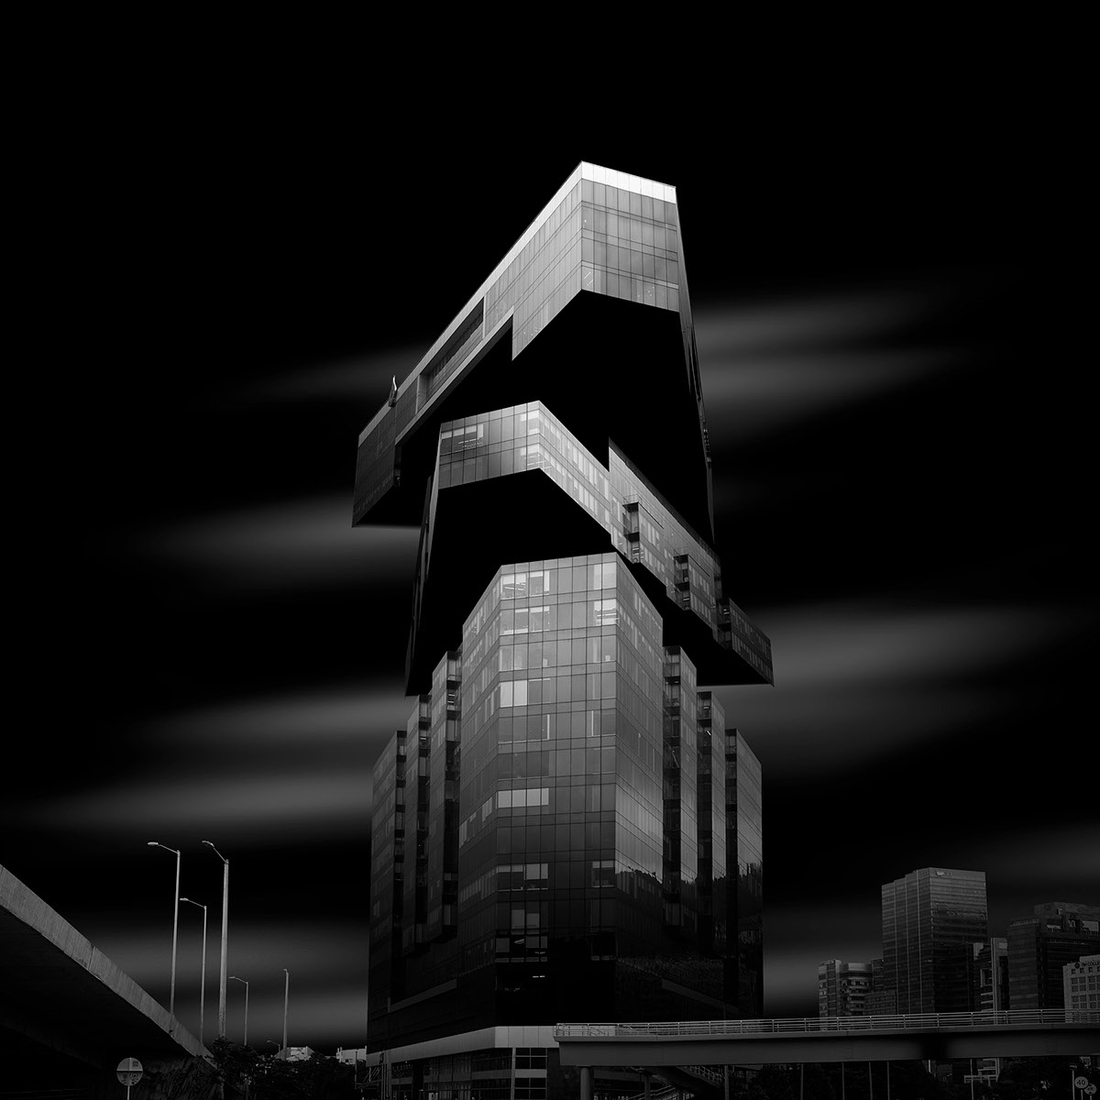 10-Daniel-Garay-Arango-Black-and-White-Surreal-Photographs-Architectural-Deconstruction-www-designstack-co